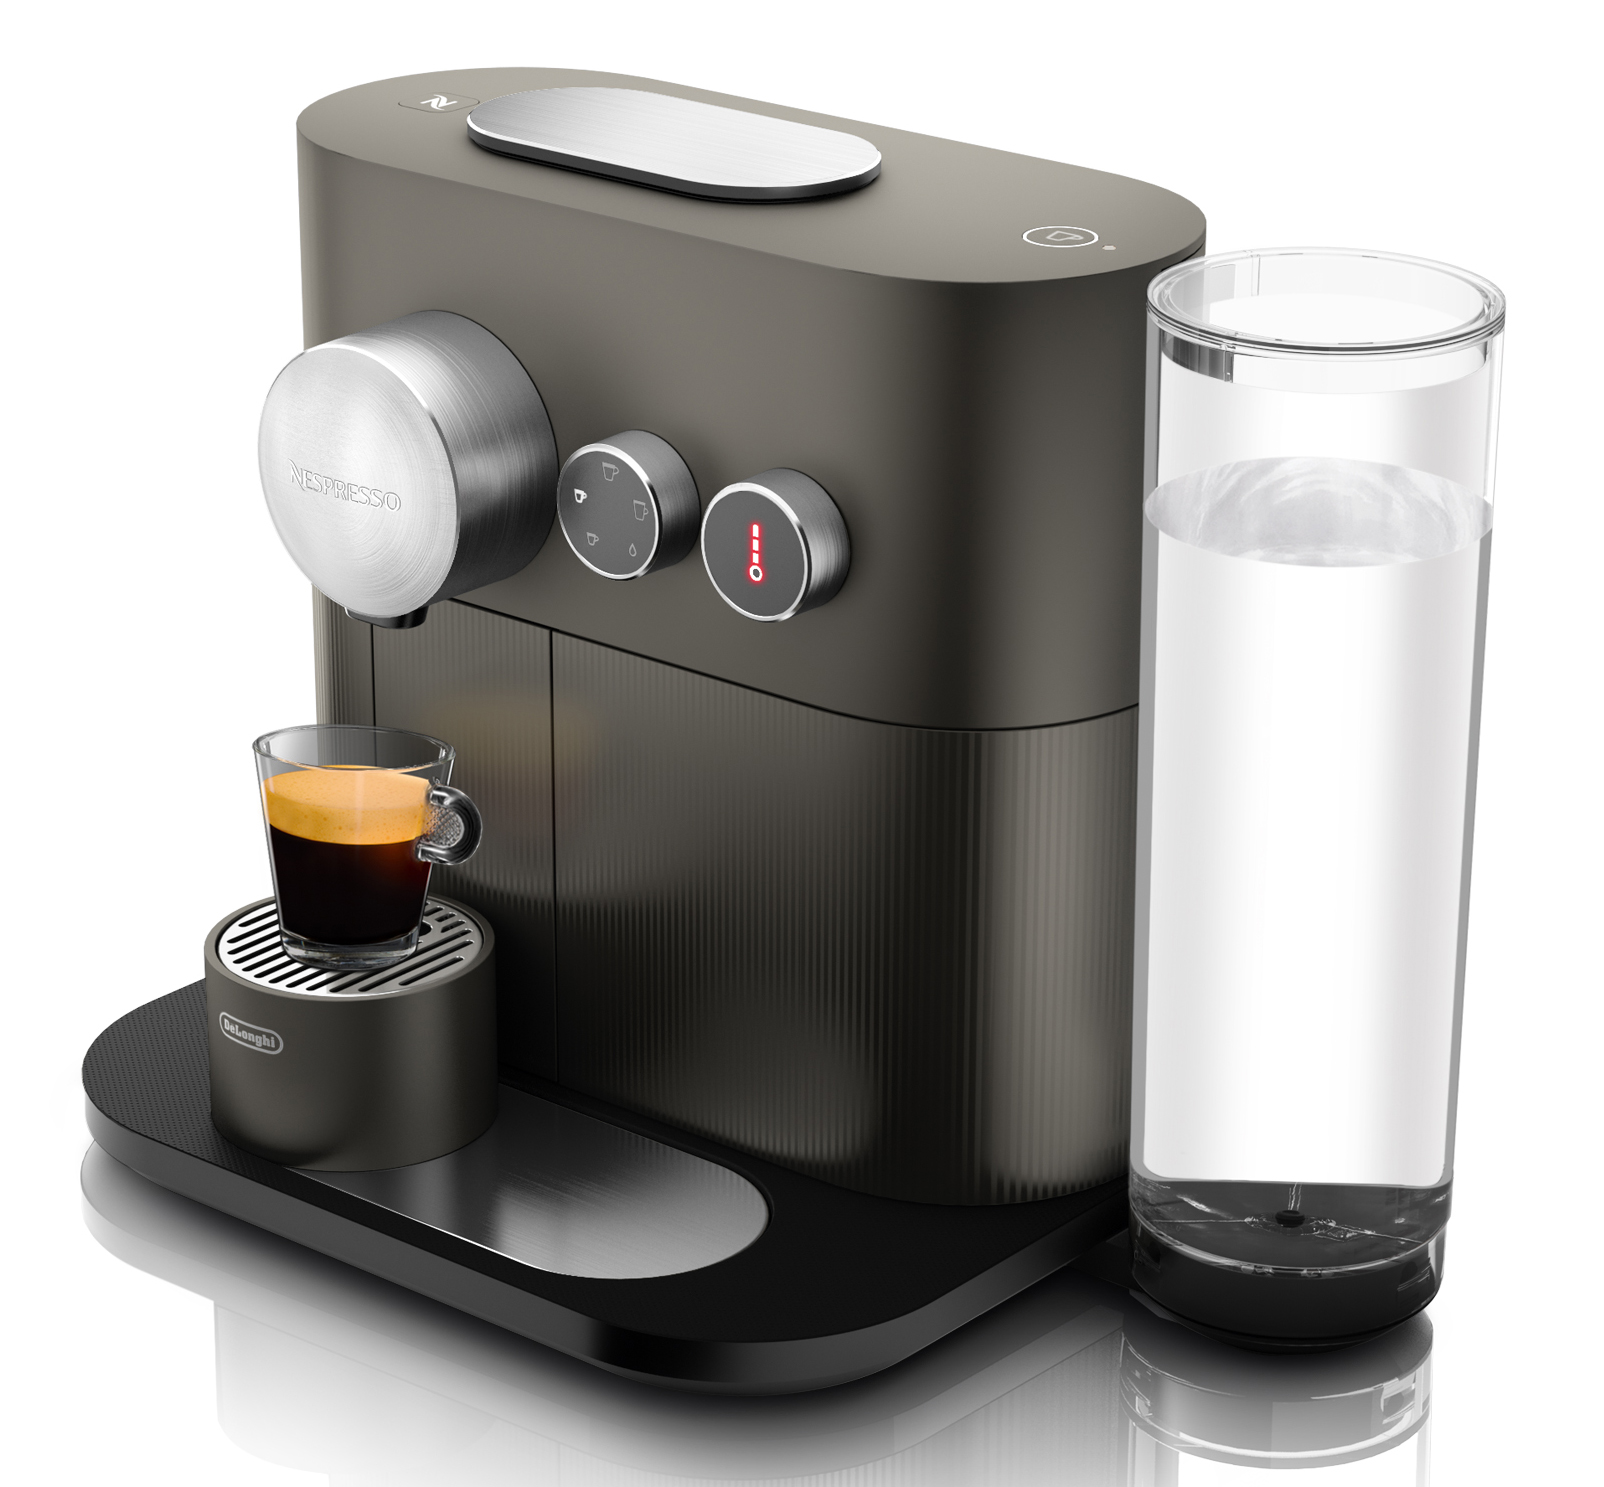 kaffeemaschine cappuccino m bel design idee f r sie. Black Bedroom Furniture Sets. Home Design Ideas